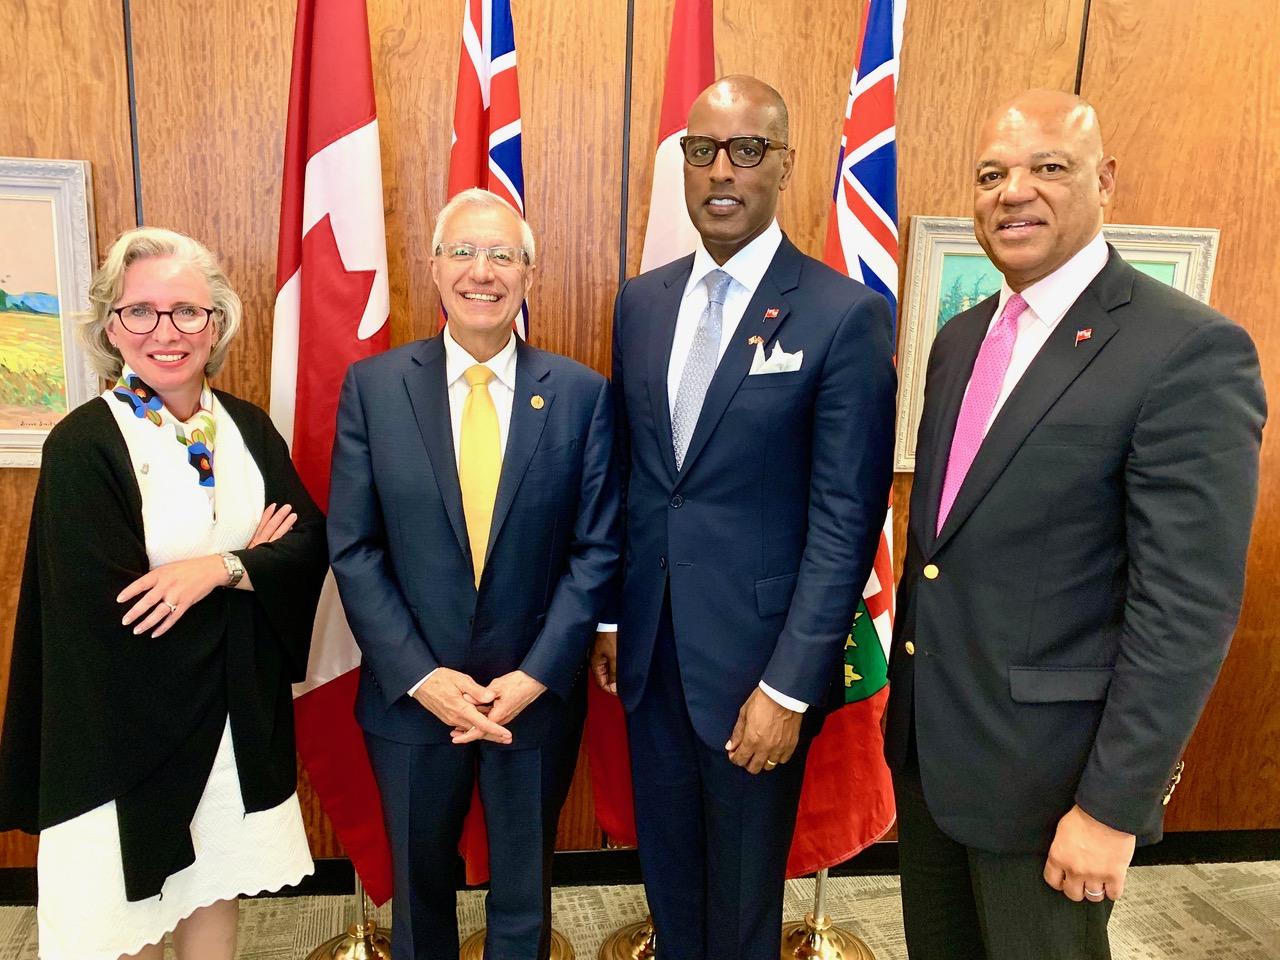 Toronto forum visit highlights business opportunities